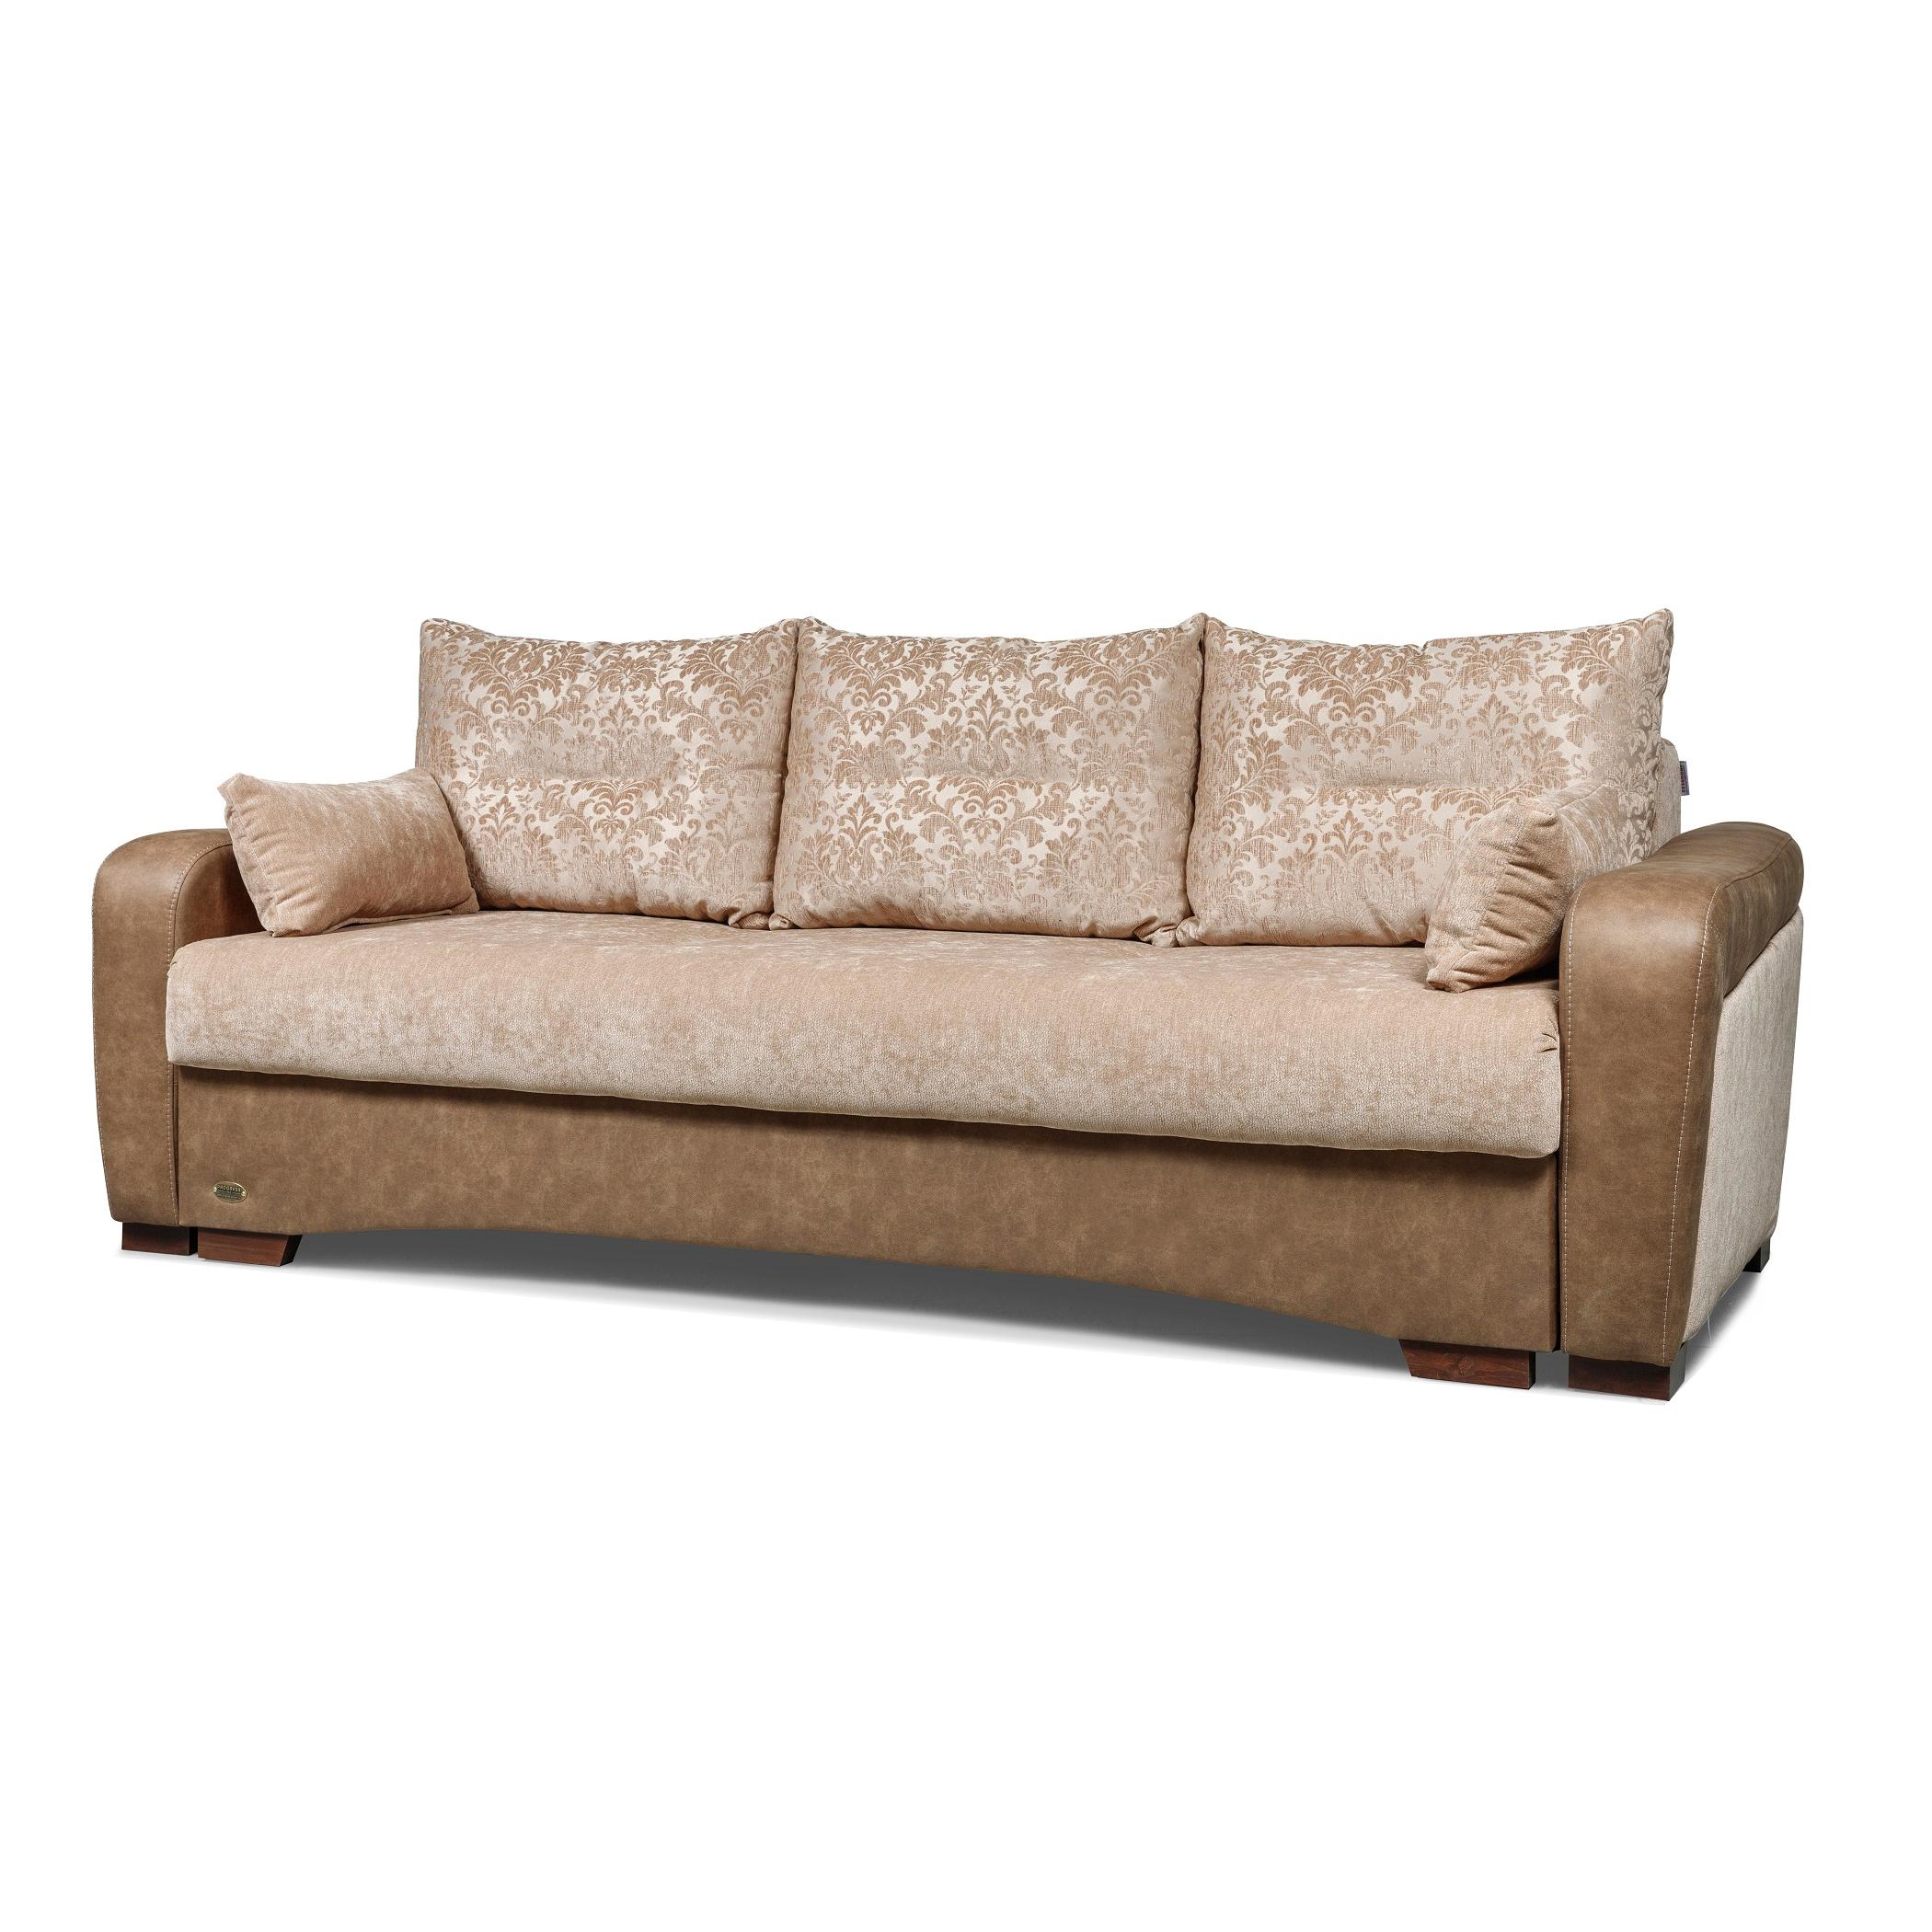 Sanrayz divan 001